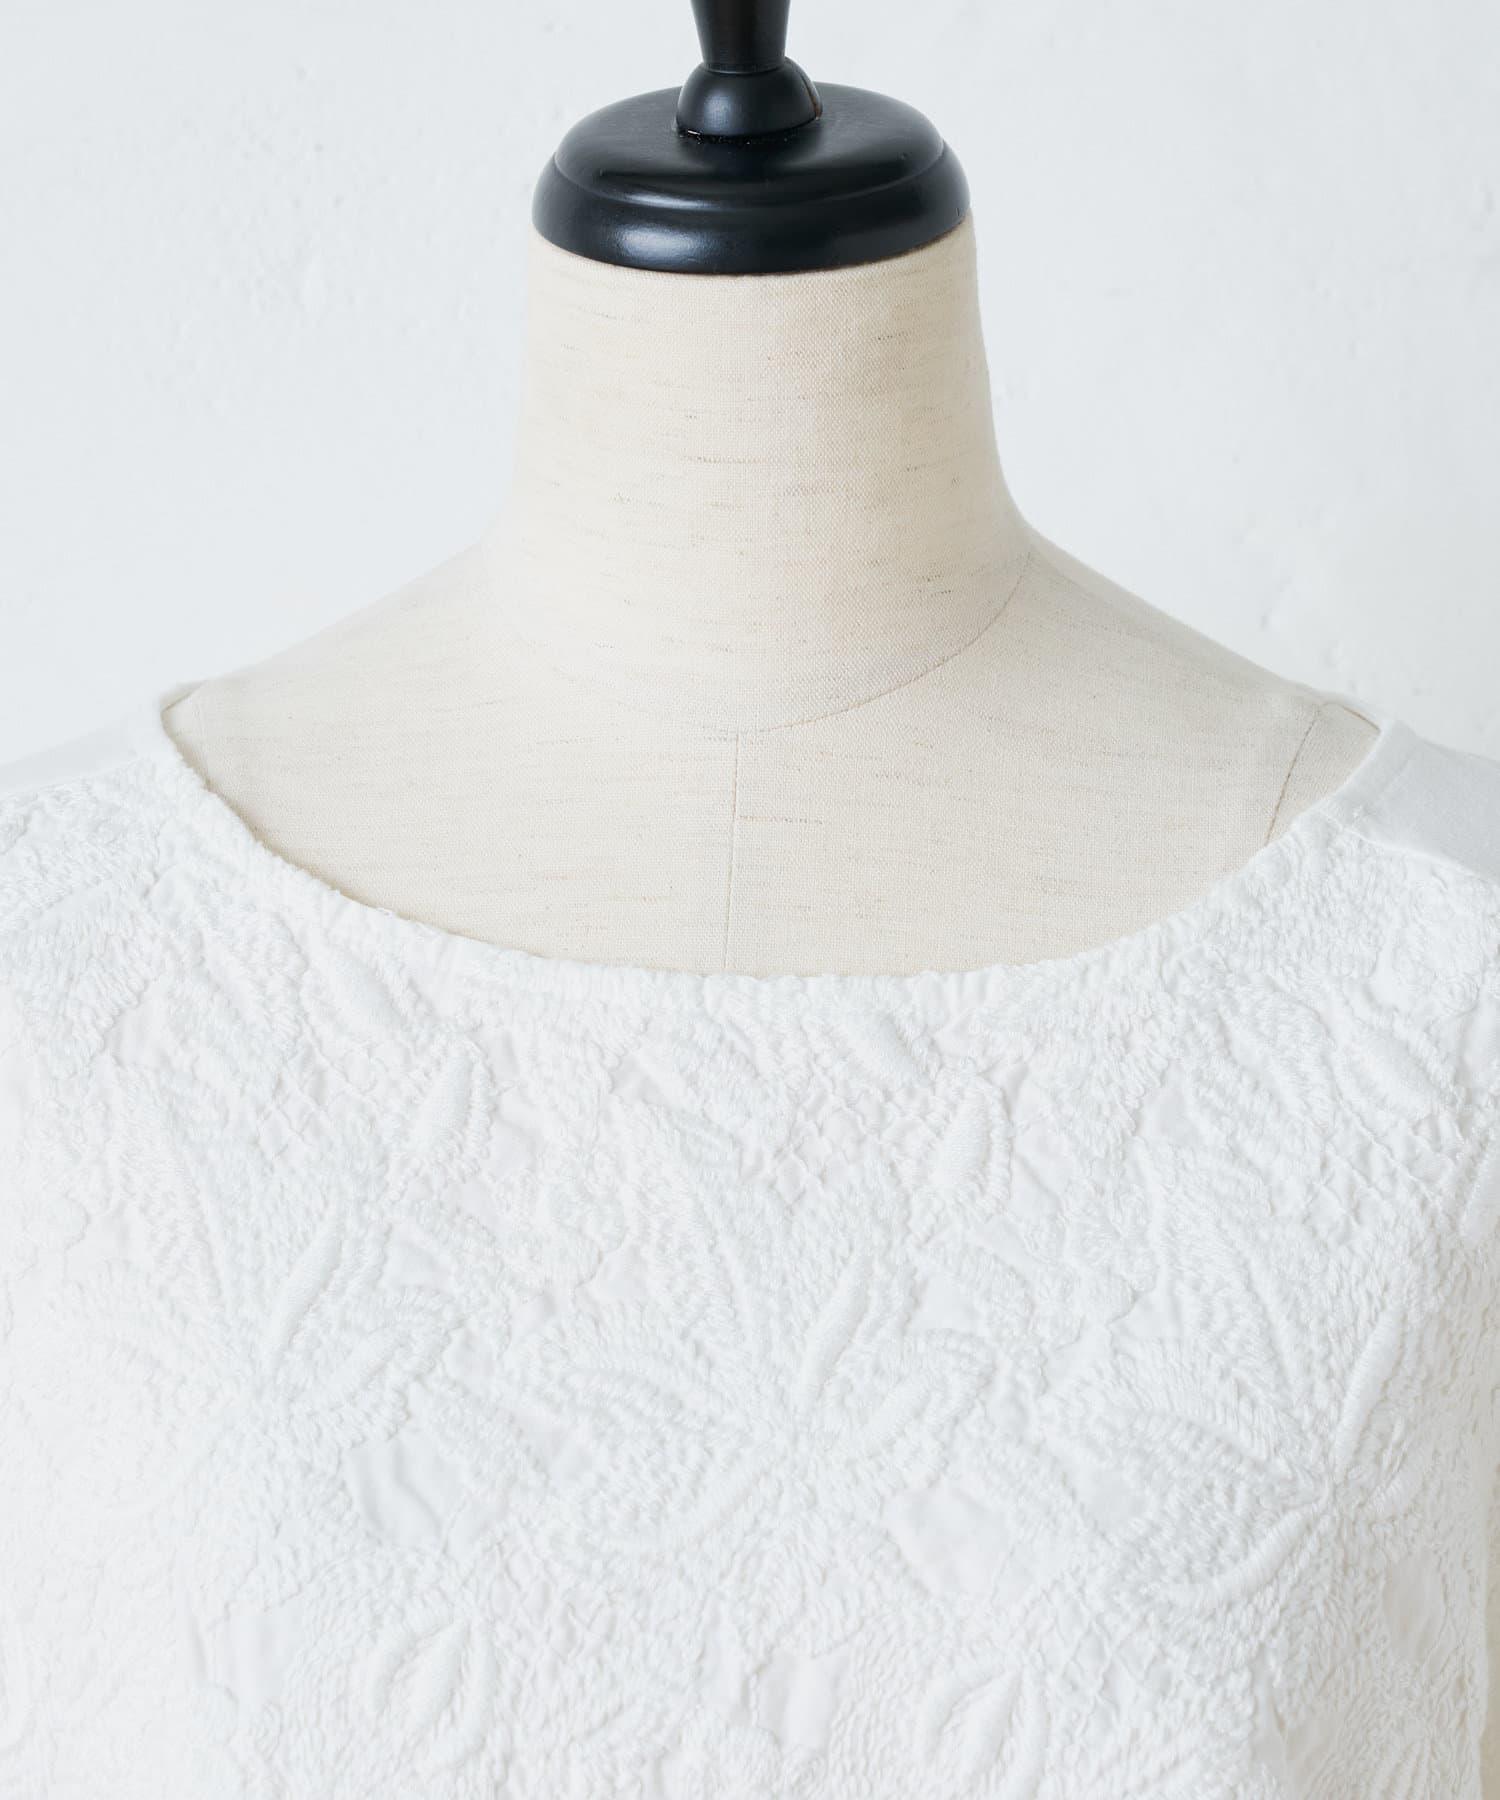 BEARDSLEY(ビアズリー) デニムフロント刺繍カットソー